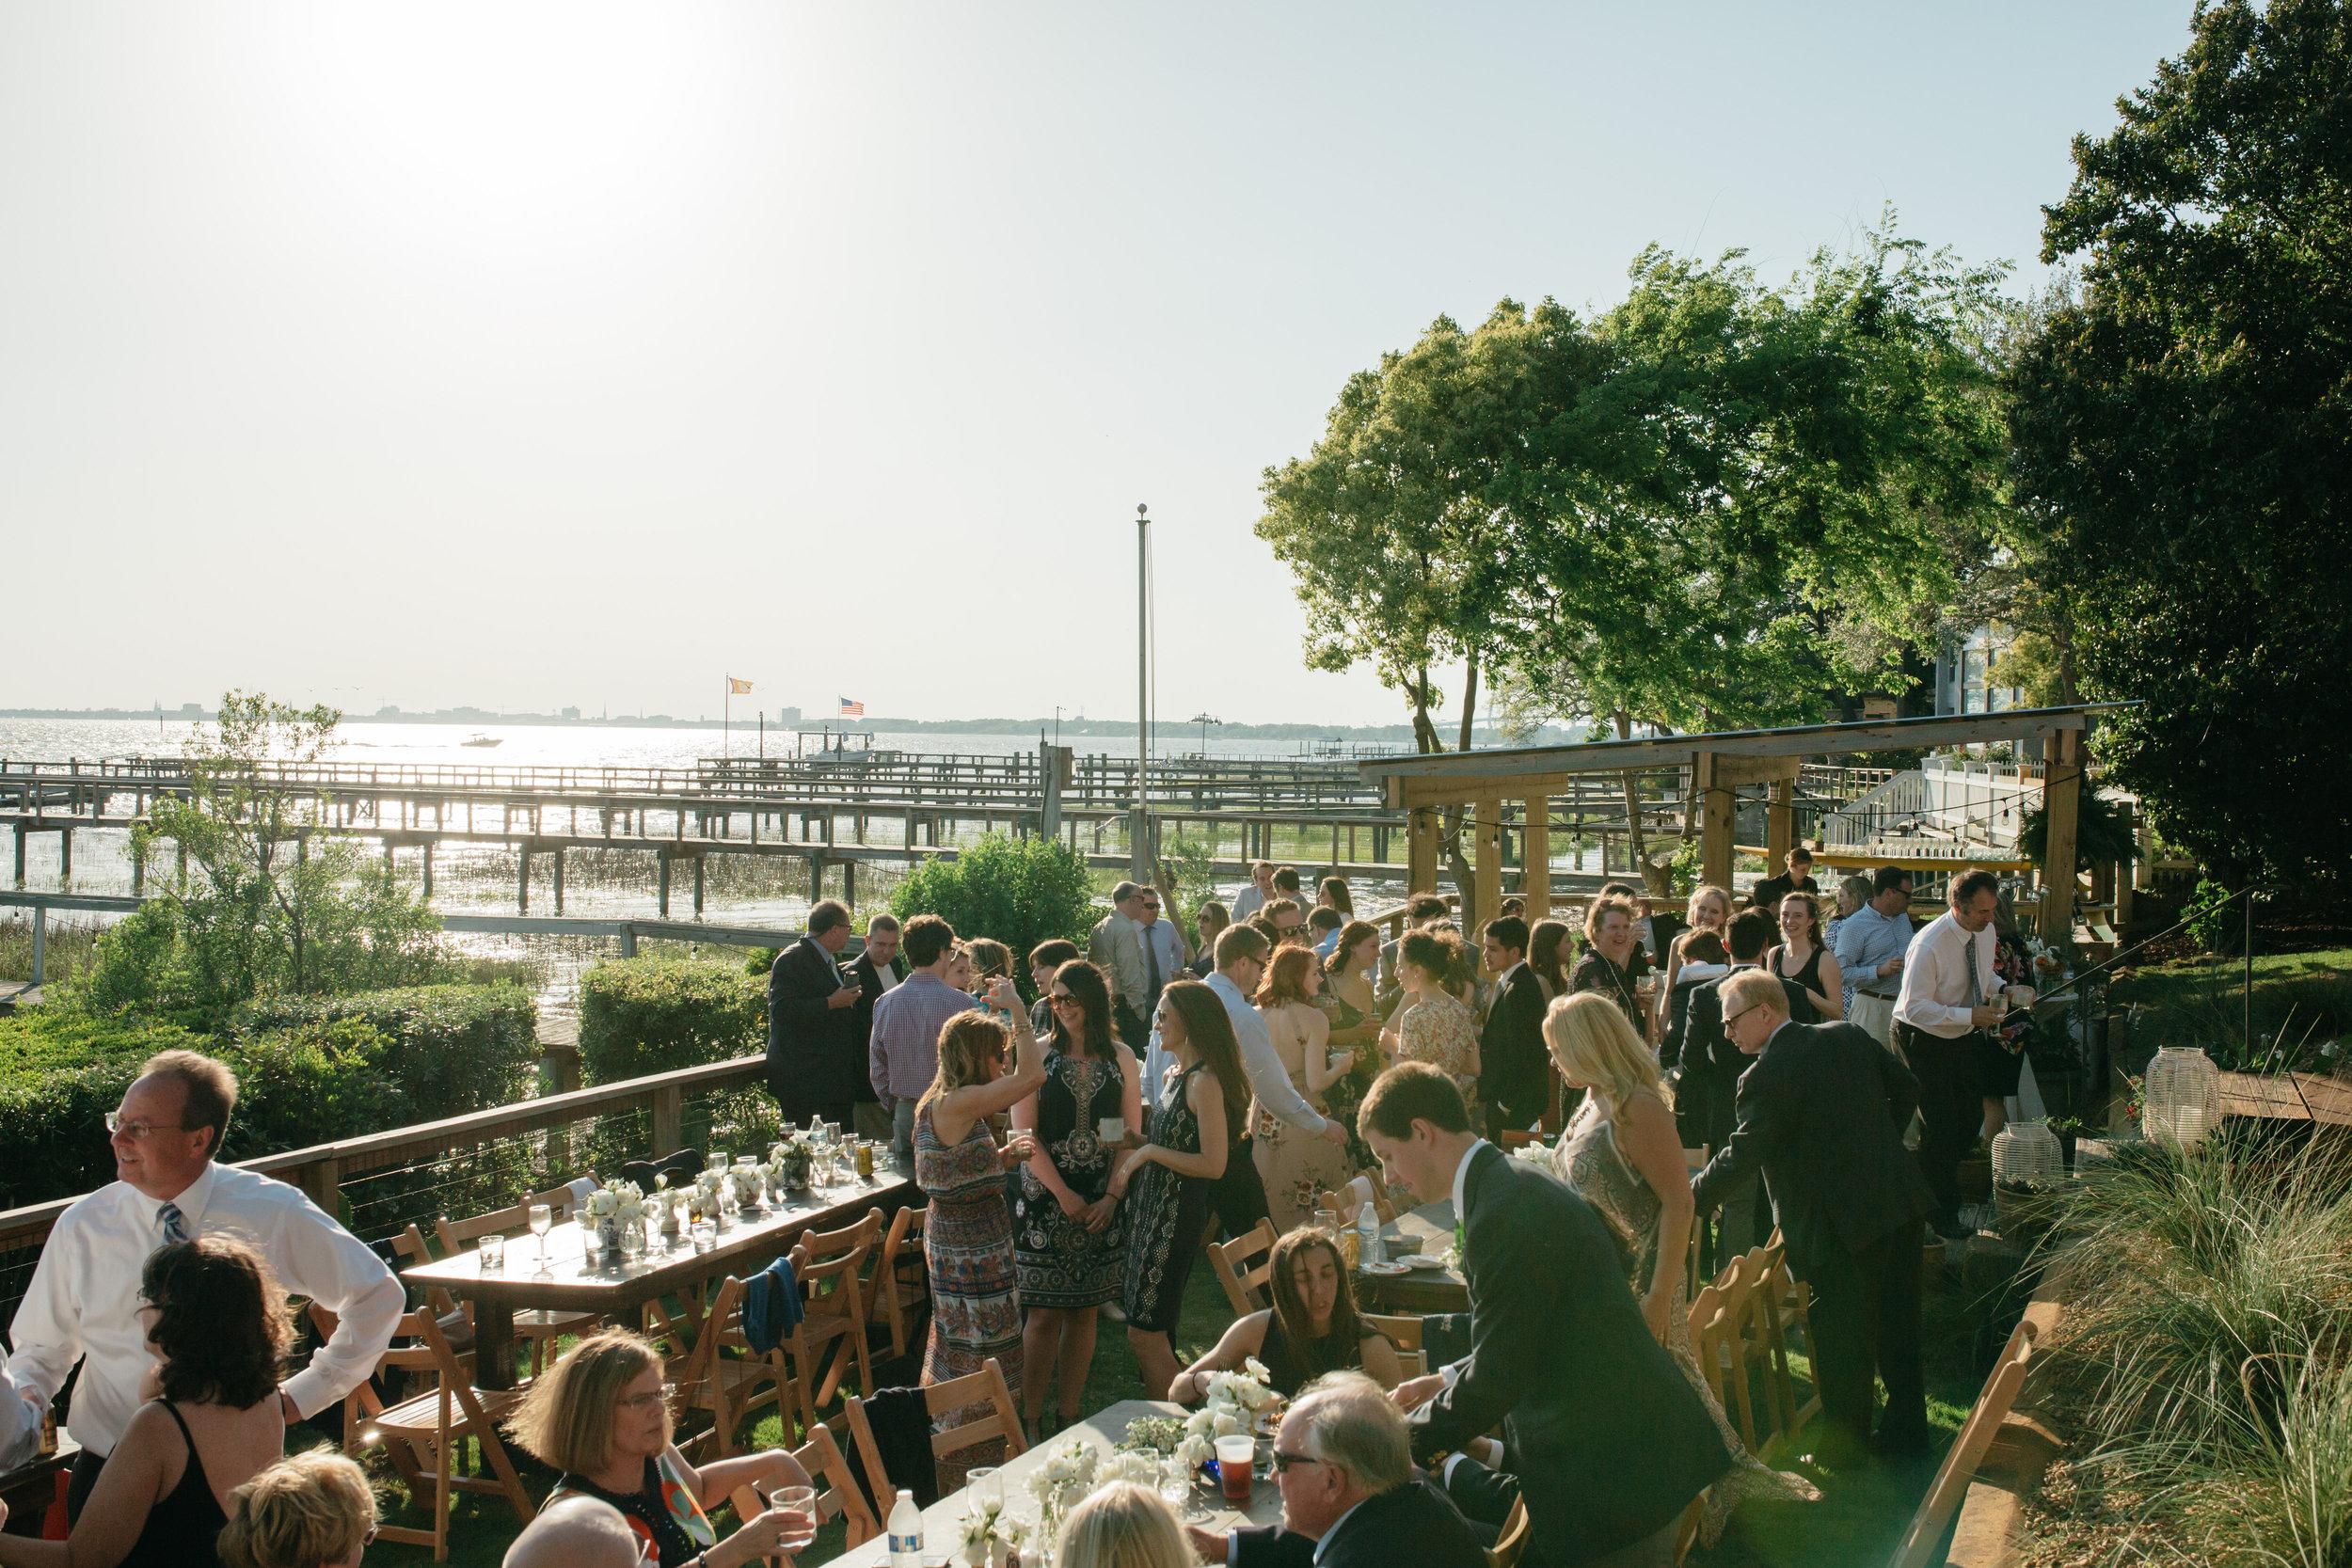 paraiso-event-design-charleston-mount-pleasant-waterfront-wedding-private-home-22.jpg